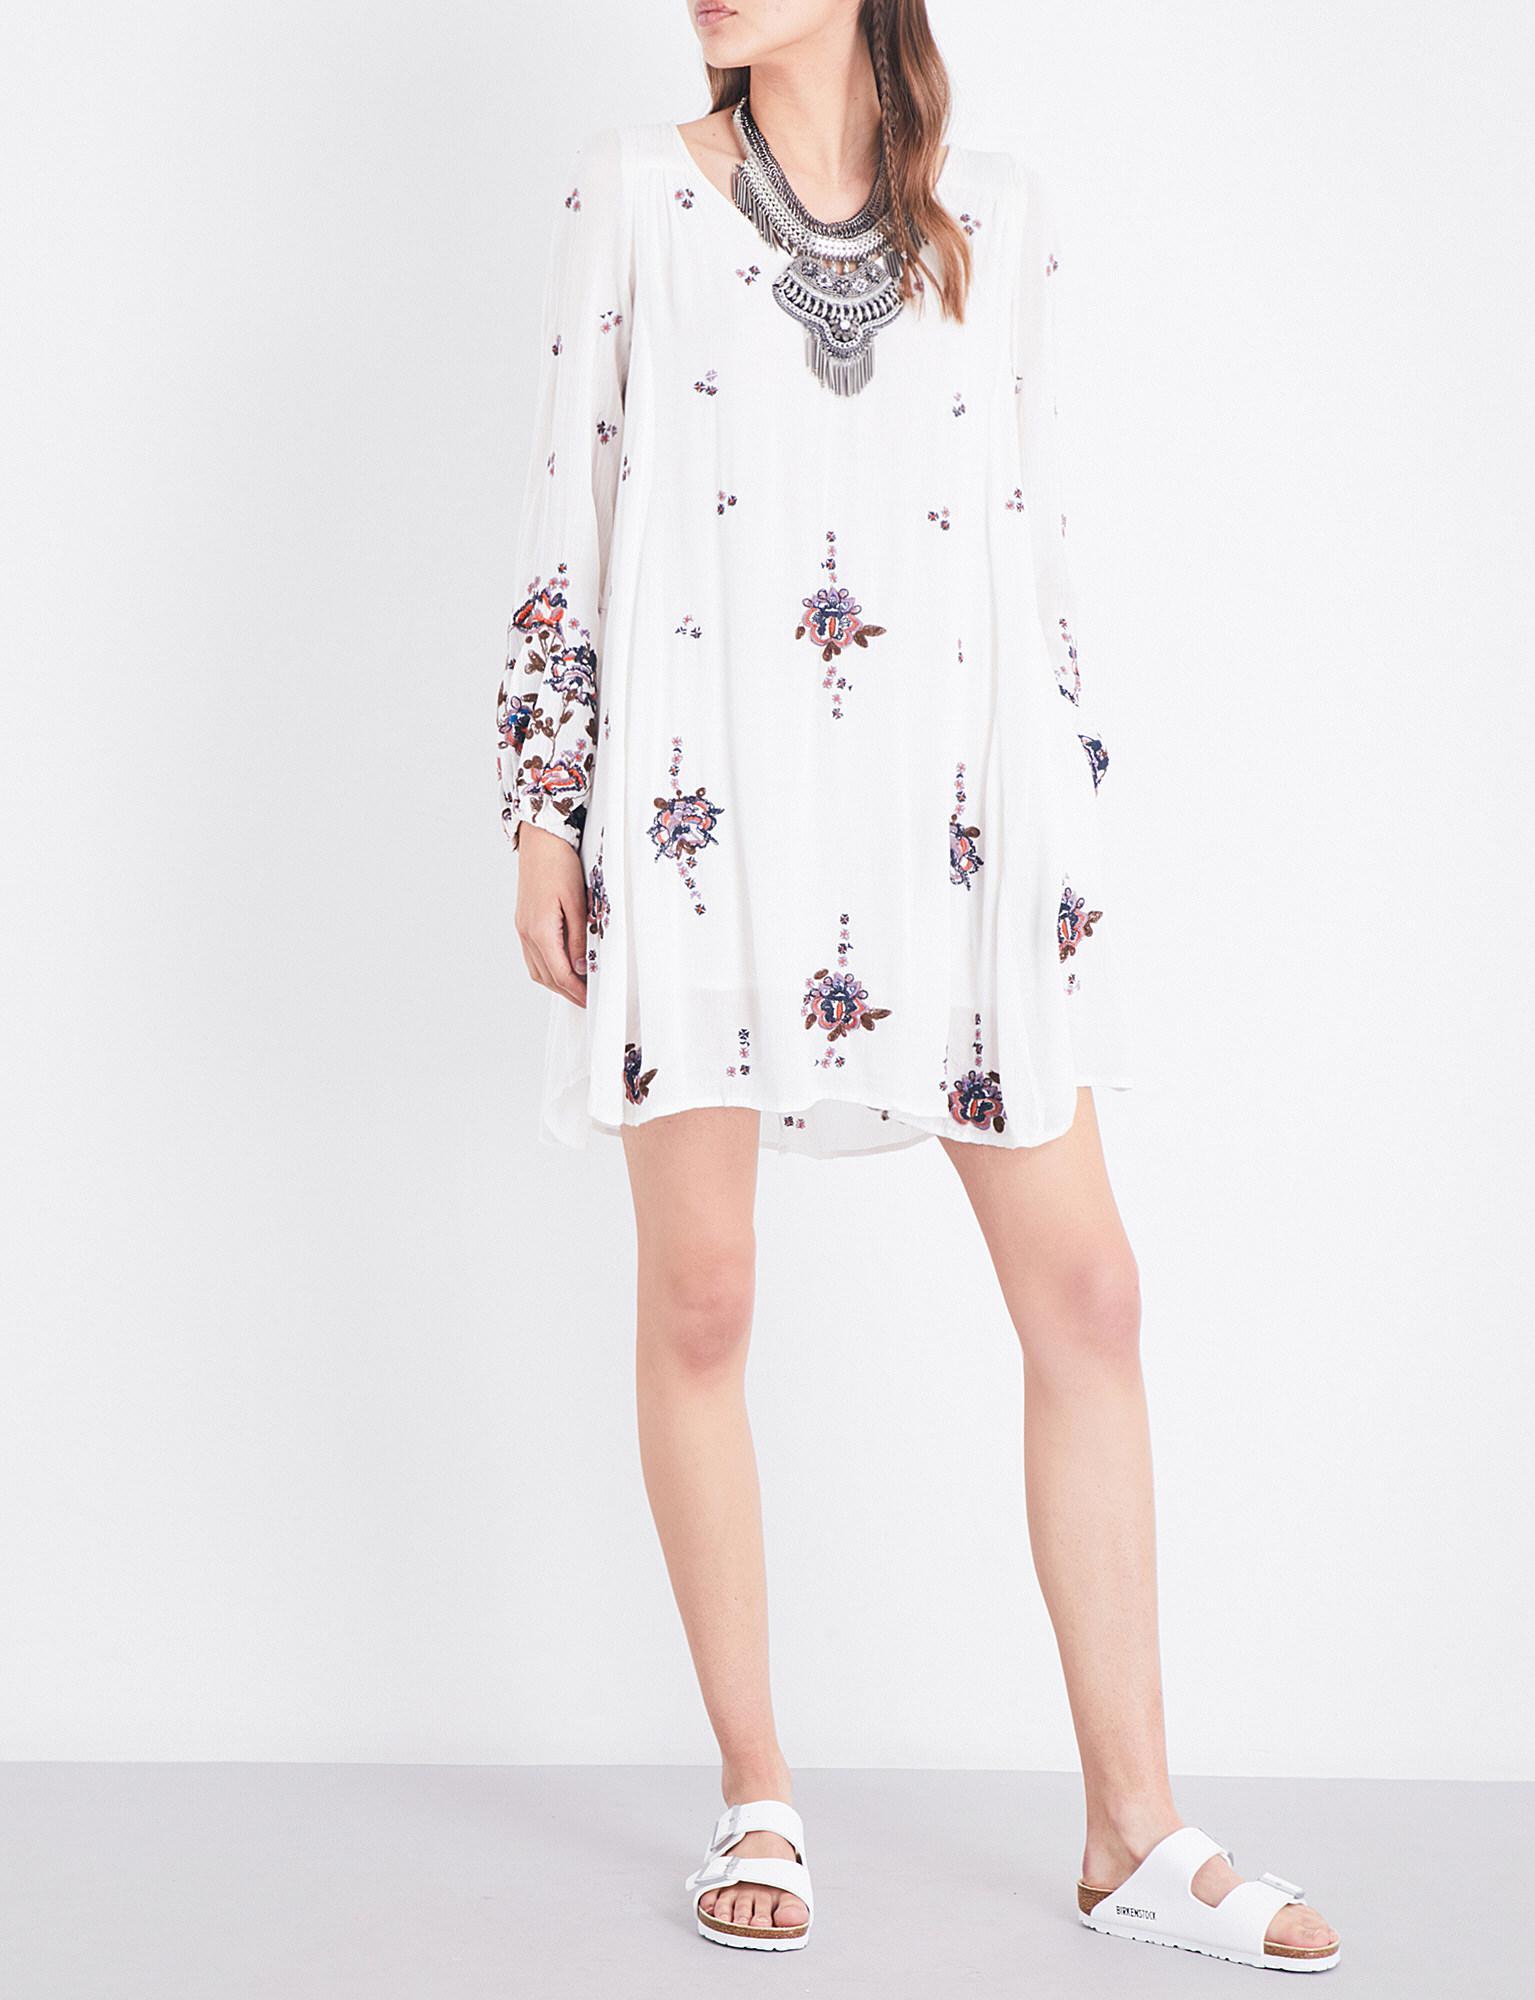 562556e21ac3 Free People Oxford Embroidered Gauze Mini Dress - Lyst